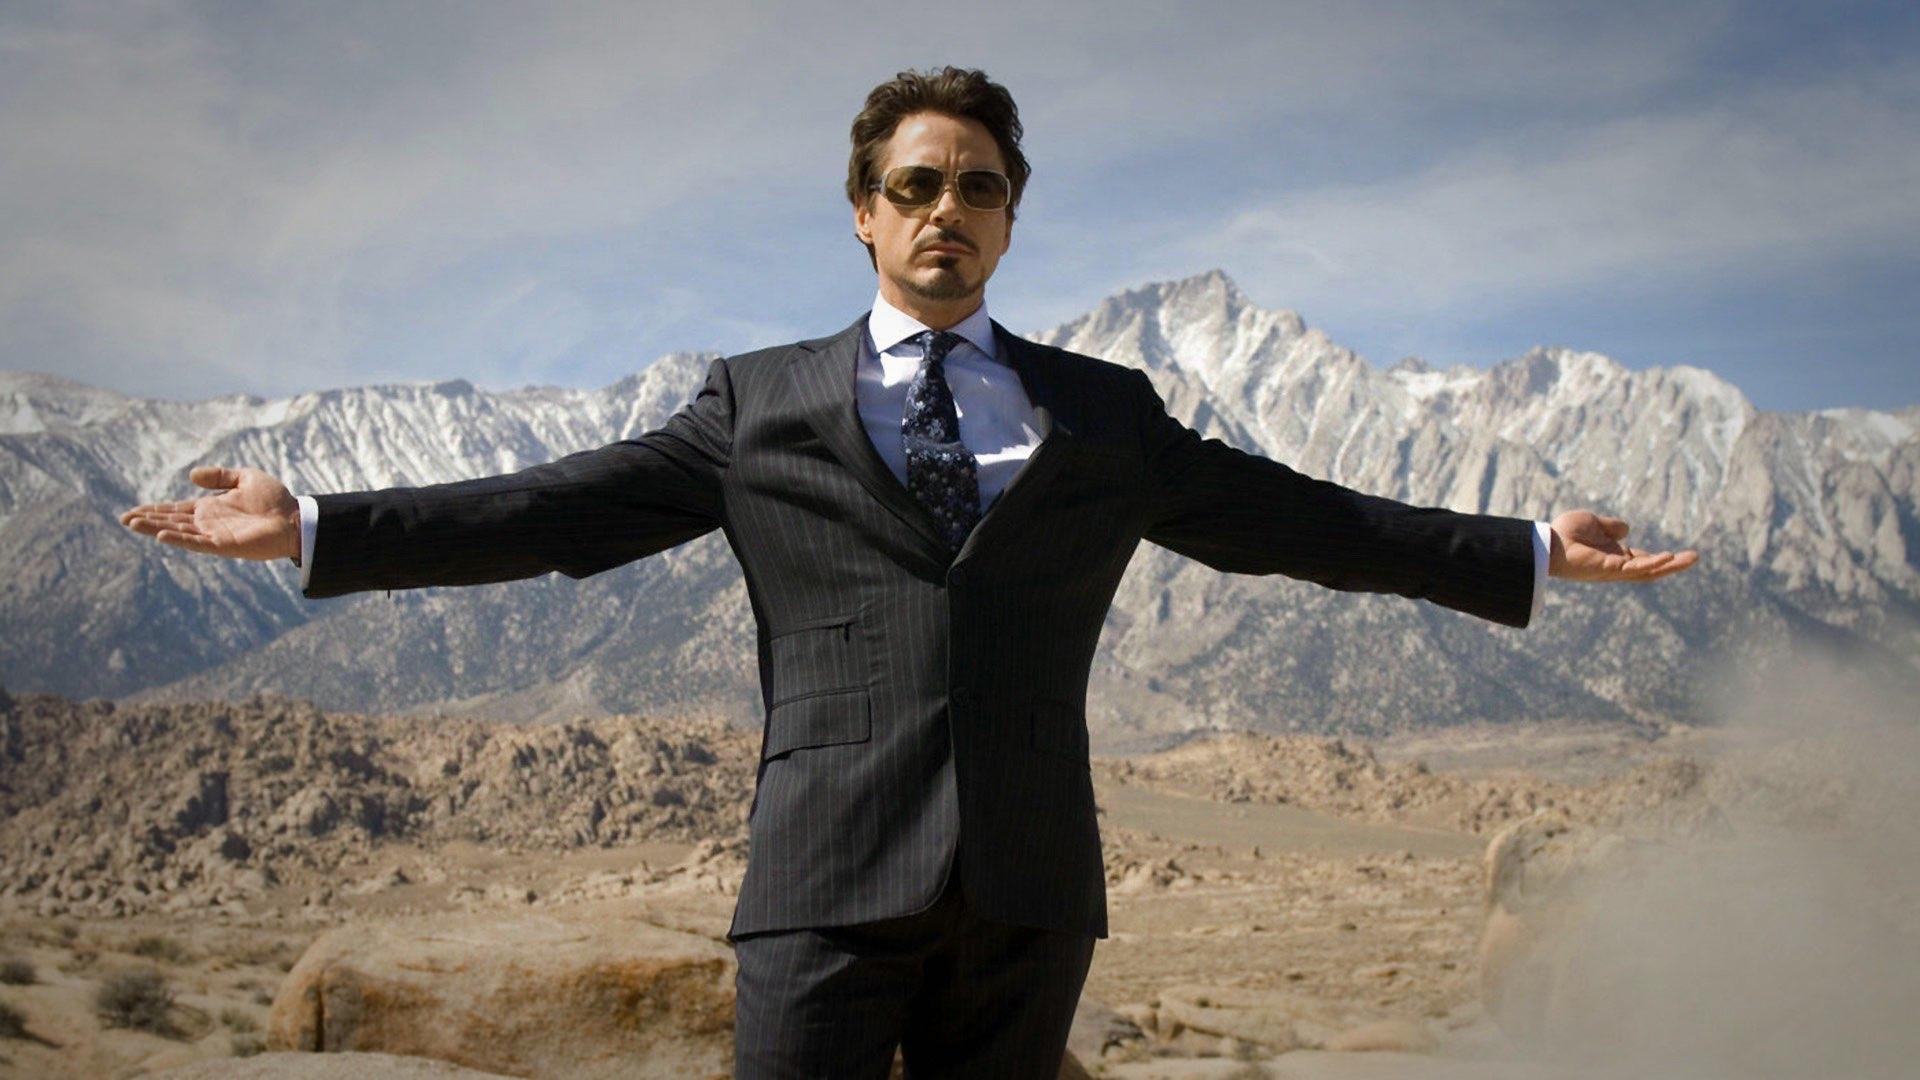 Der spätere 'Iron Man'Tony Stark (Robert Downey Jr.)